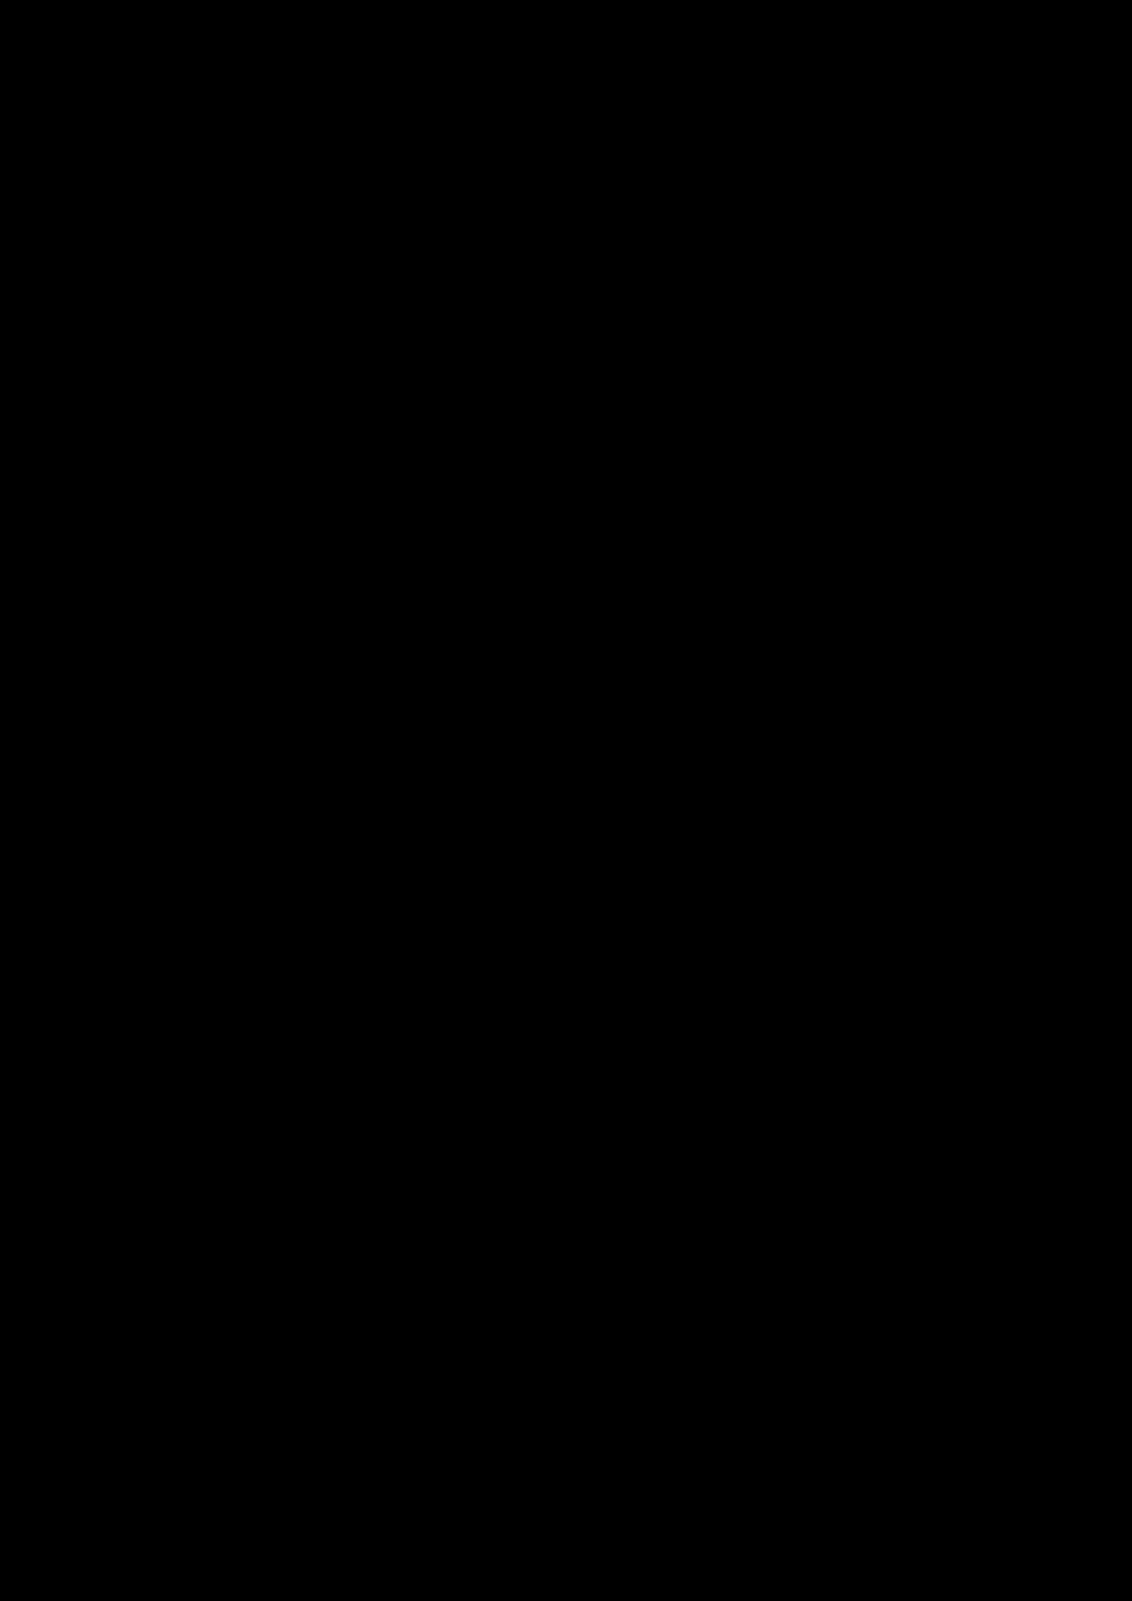 Prosti slide, Image 35